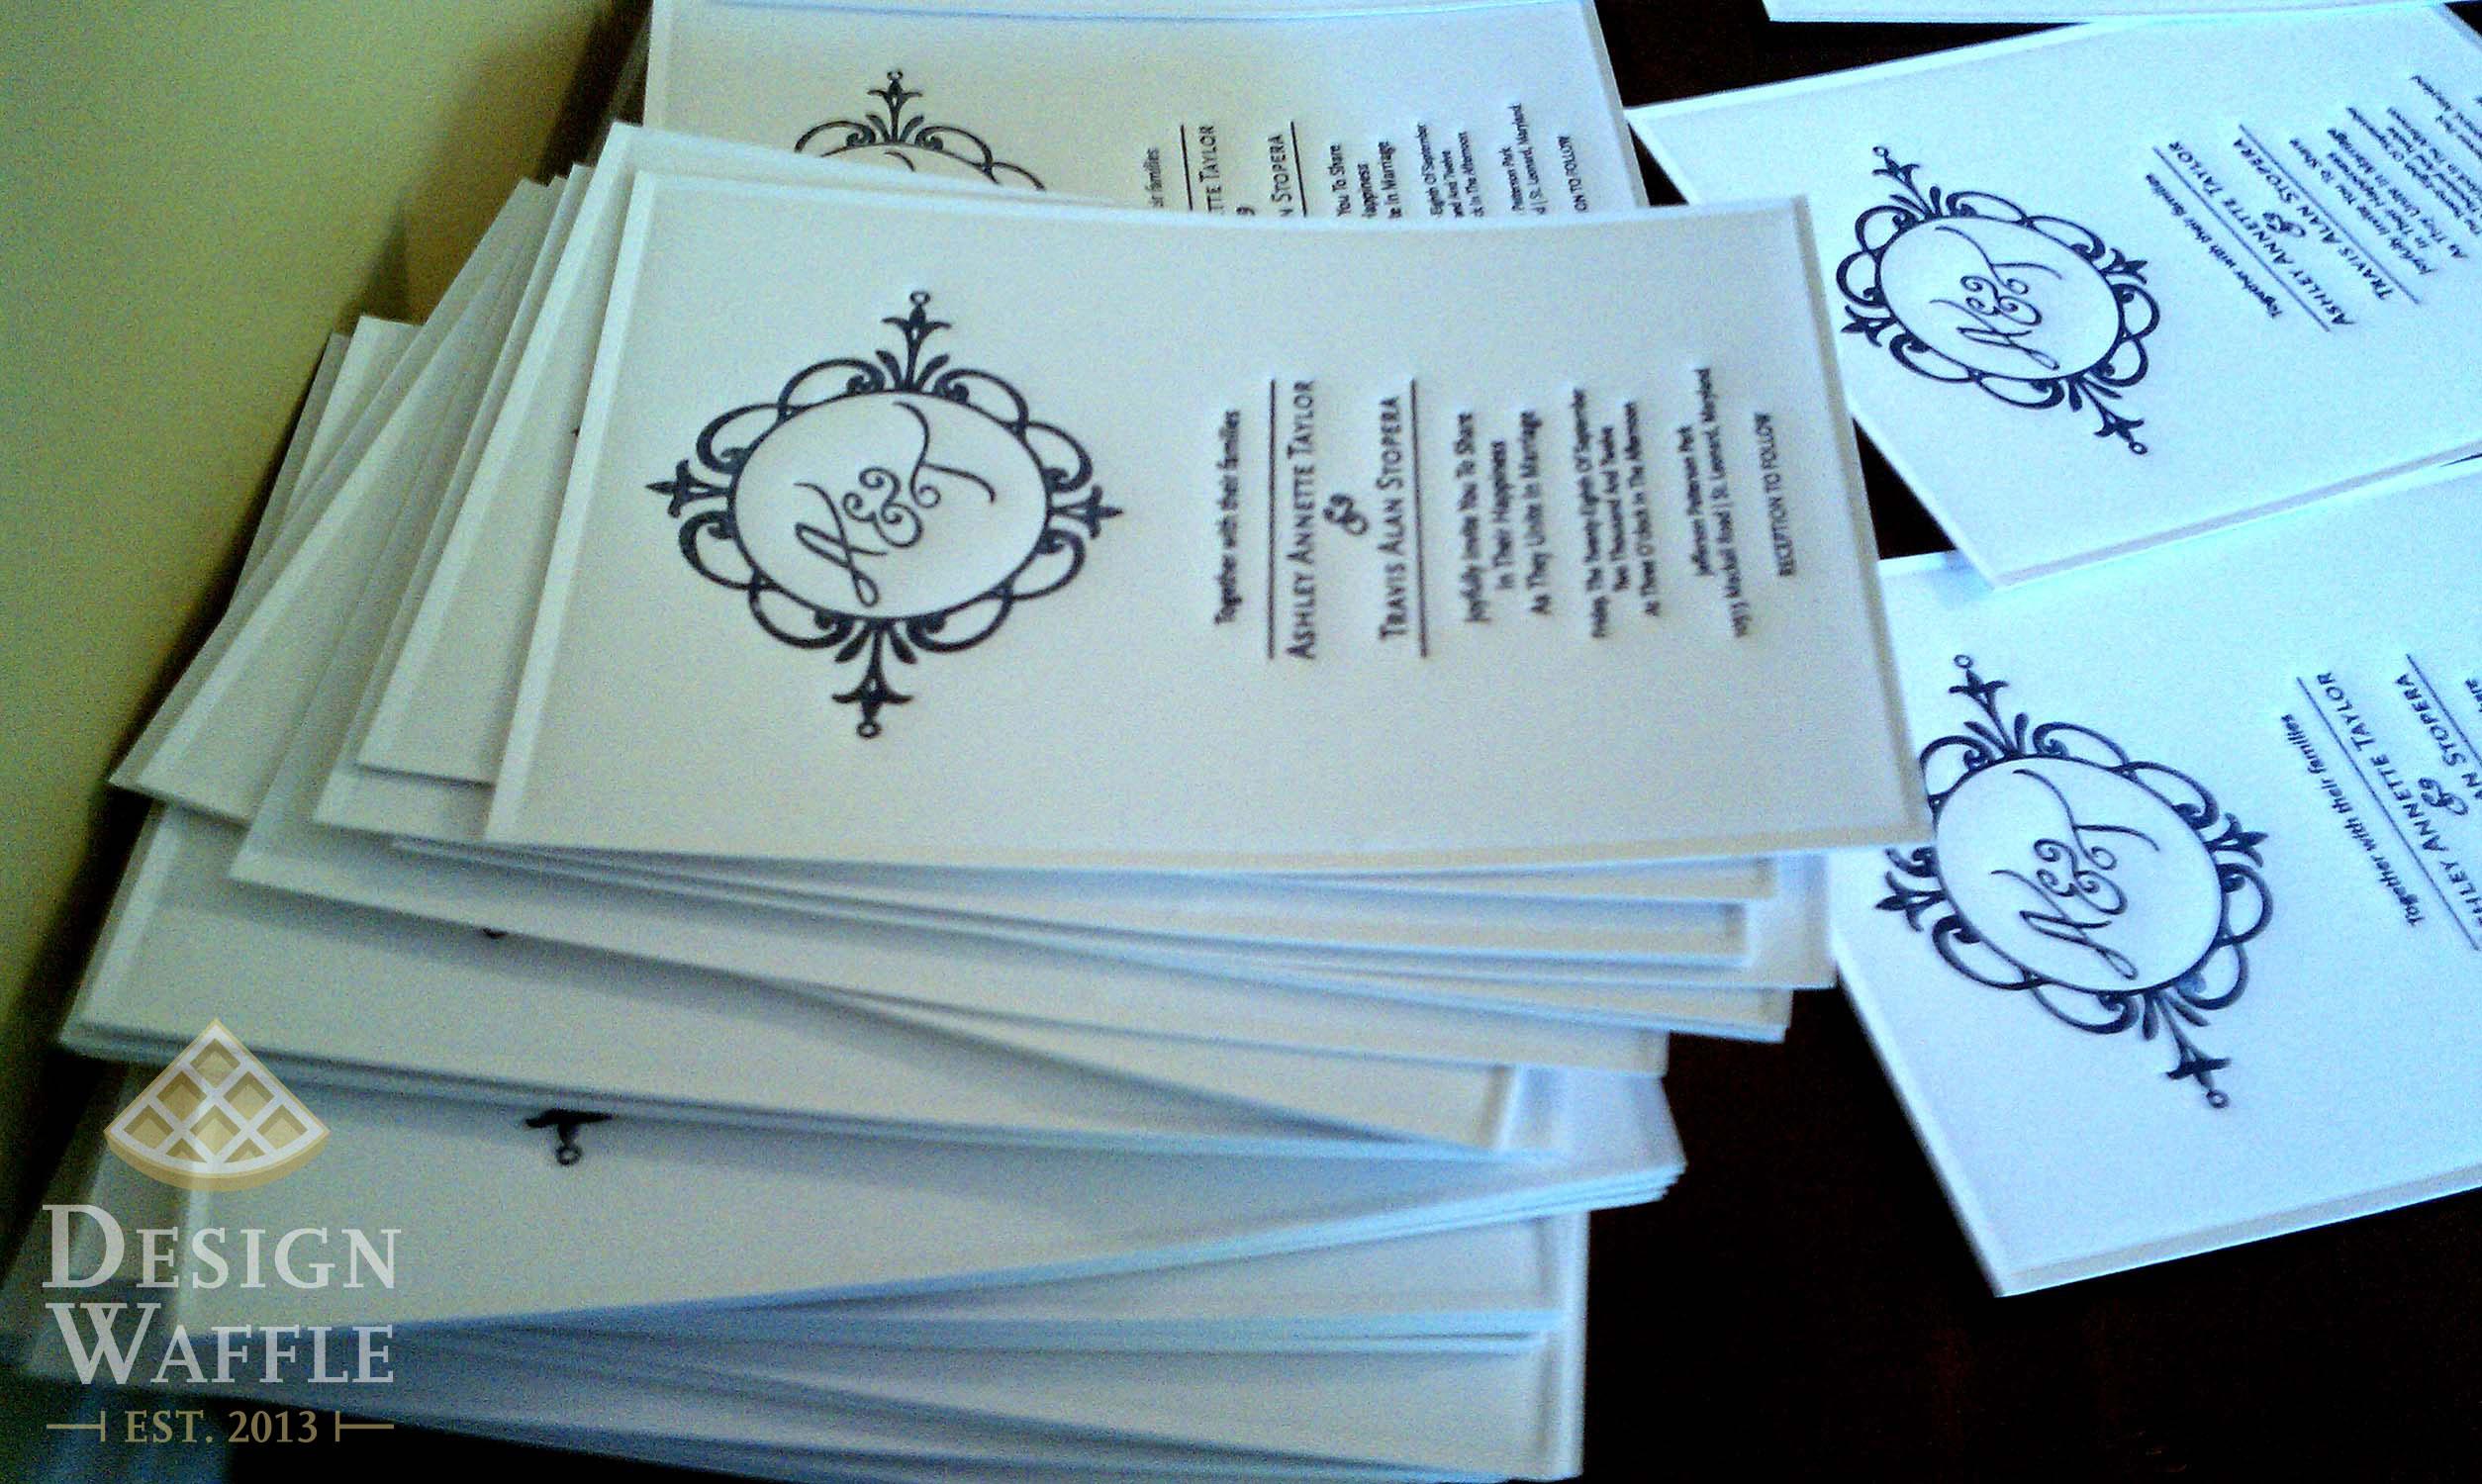 Letterpress love diy wedding invitations design waffle diy letterpressed wedding invitations finished solutioingenieria Images